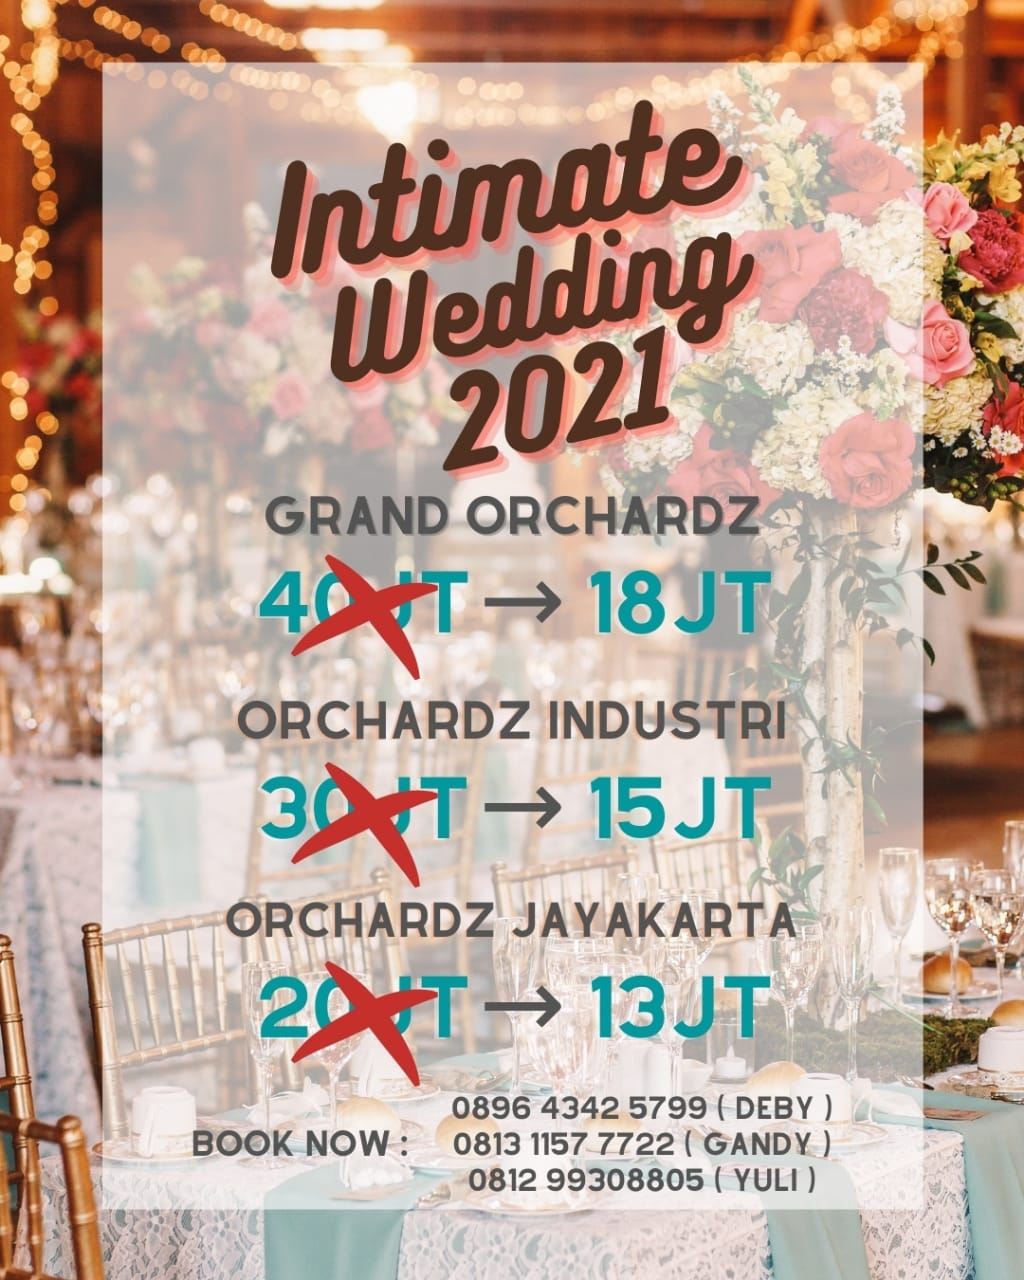 Orchardz Hotel Group Jakarta Intimate Wedding Package Mnctrijaya Com